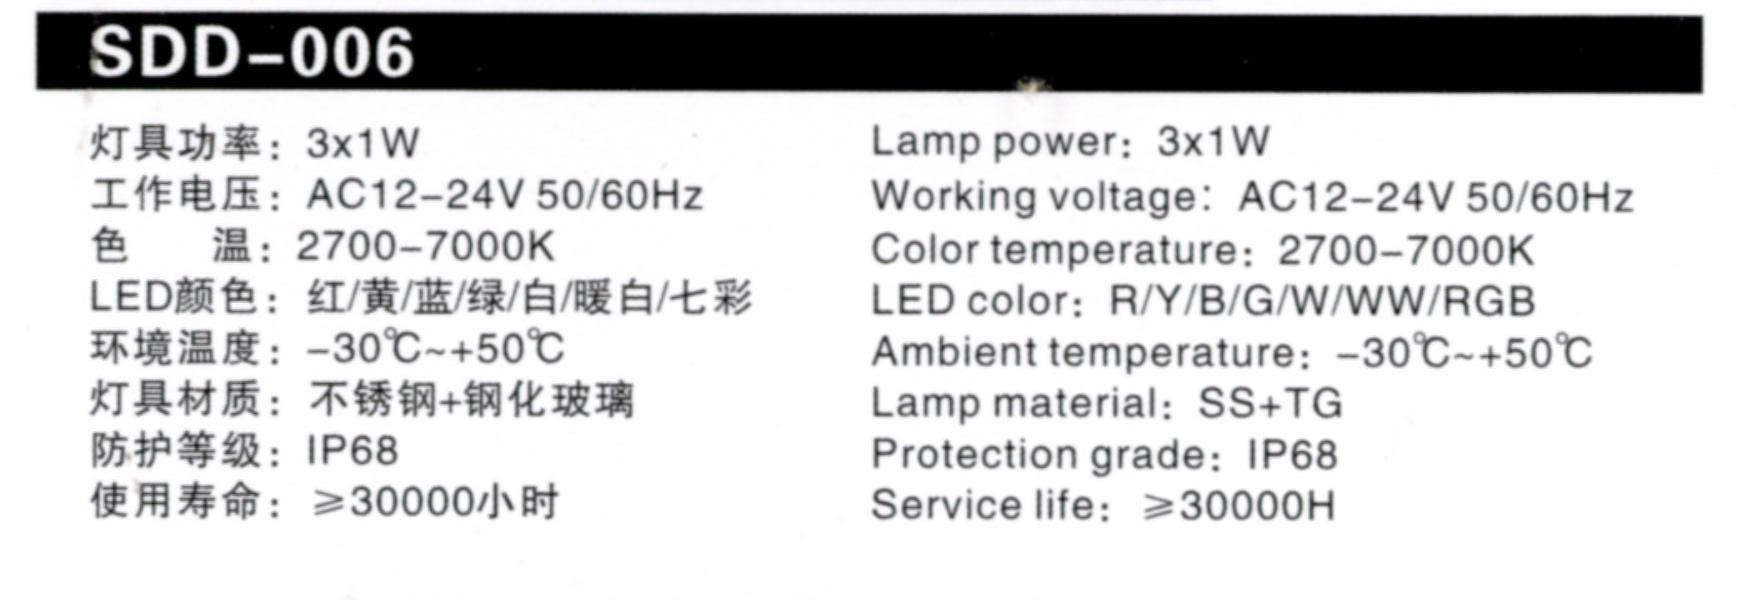 LED水底灯Model∶SDD-006参数.jpg